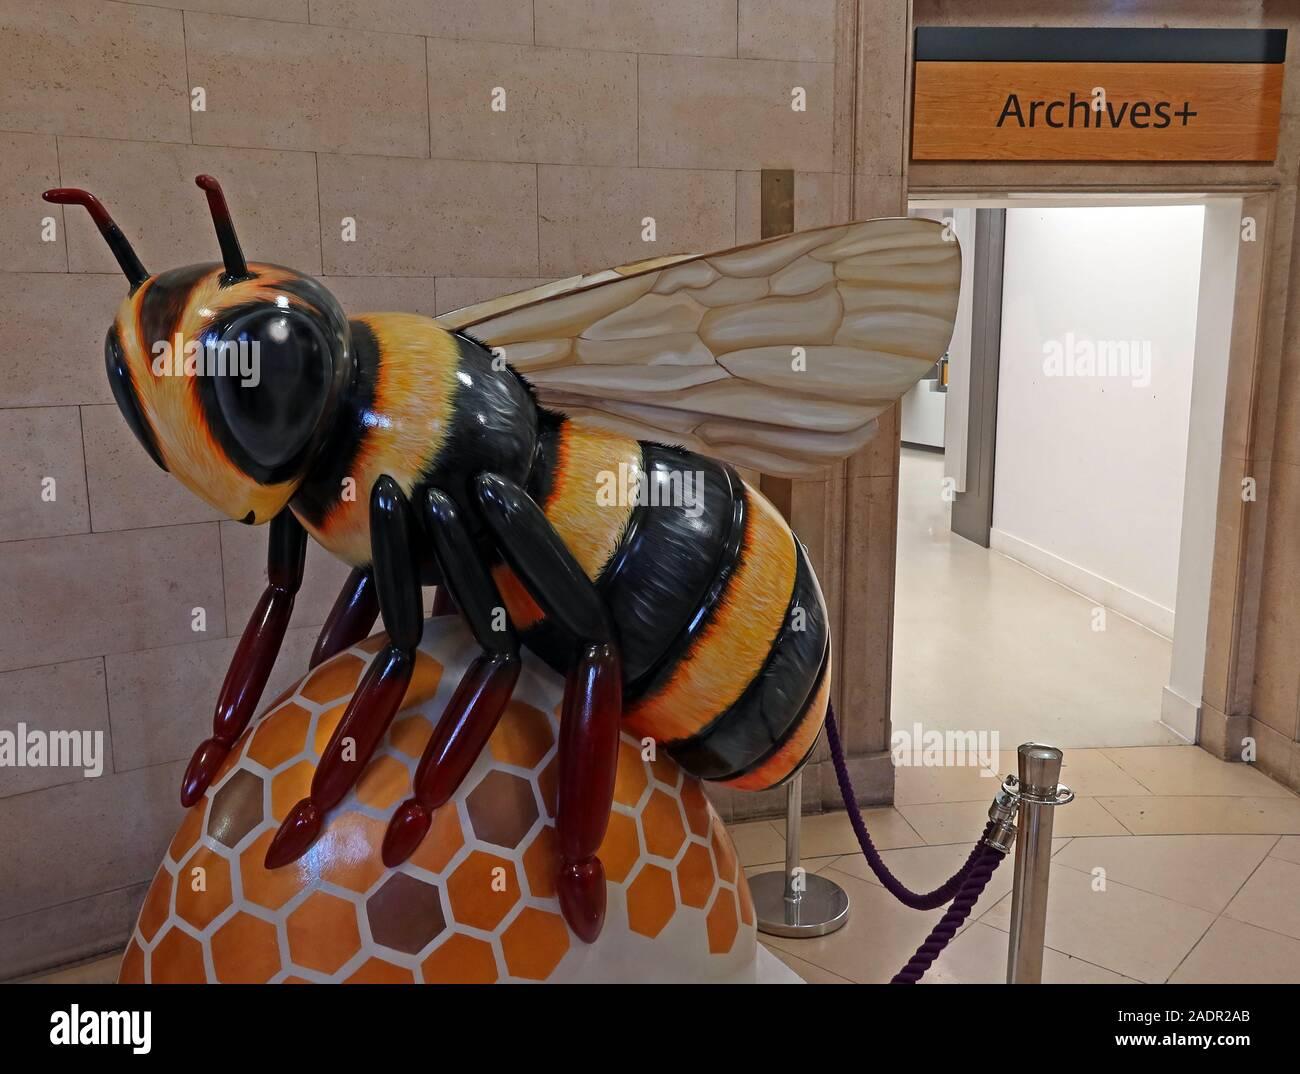 GoTonySmith,HotpixUK,@HotpixUK,England,UK,M2 5PD,historic,Bee In The City,beeinthecitymcr.co.uk,beeinthecitymcr,book,books